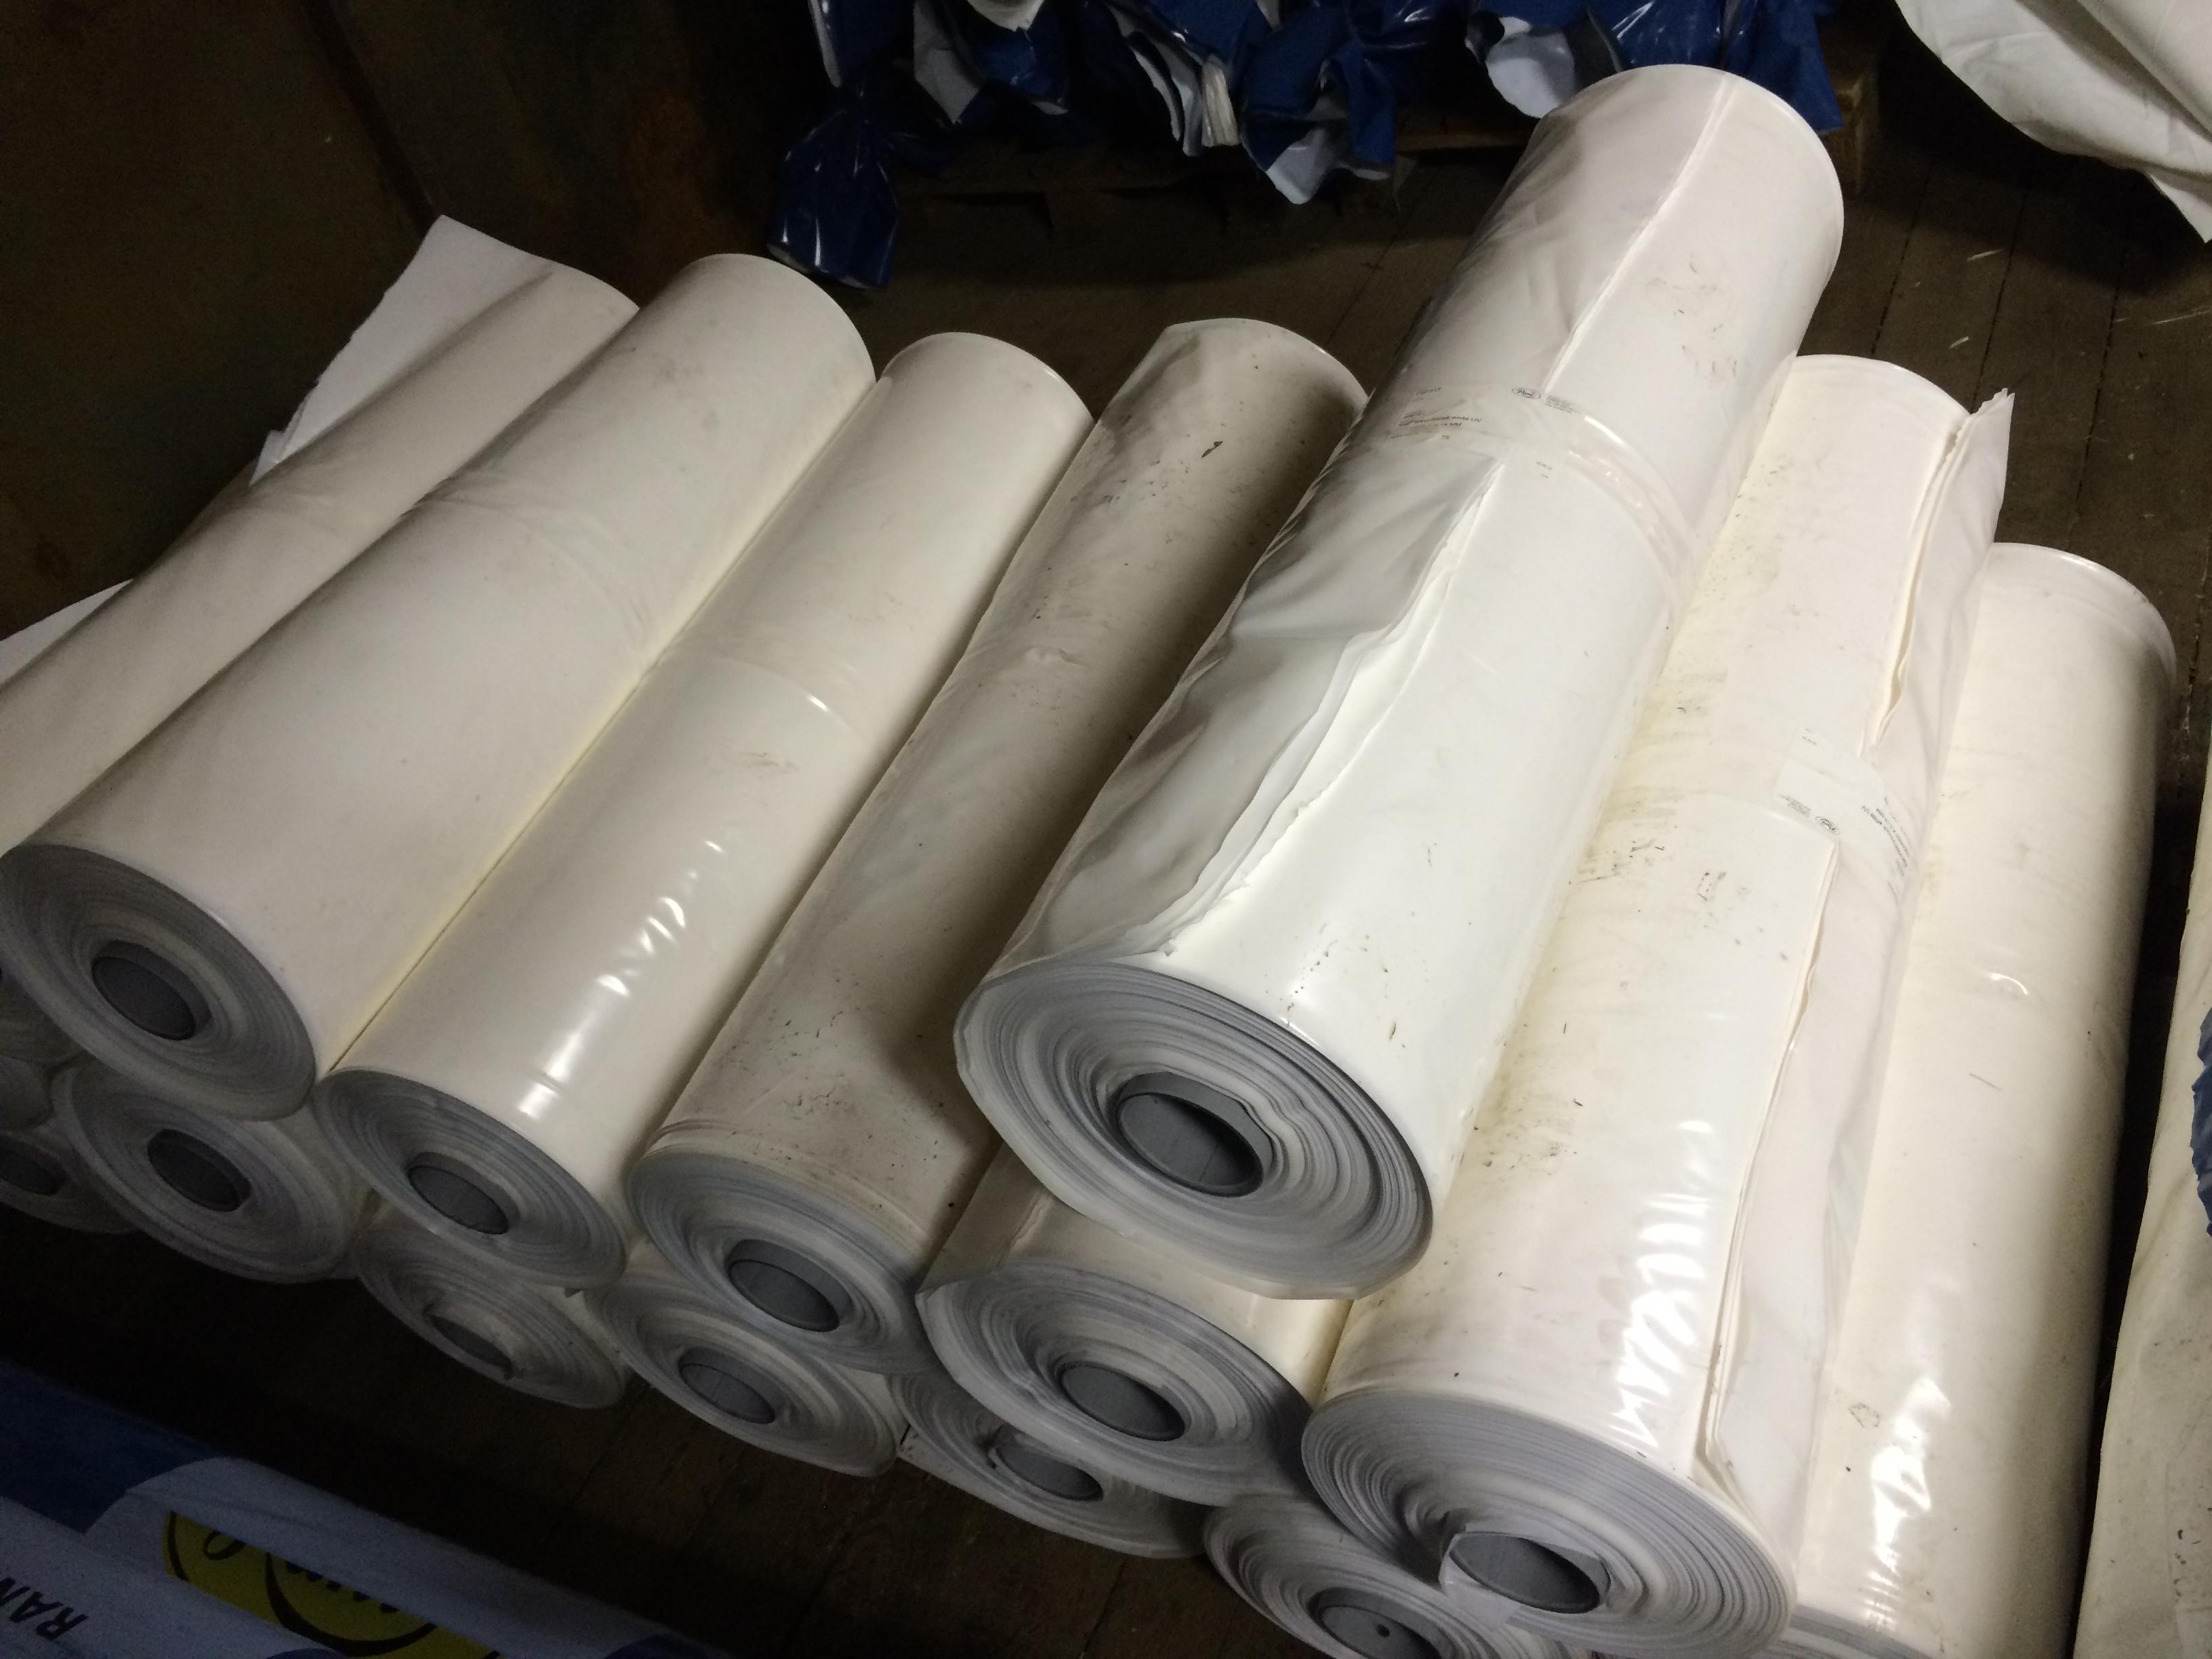 термоусадочная пленка упаковка крупных грузов